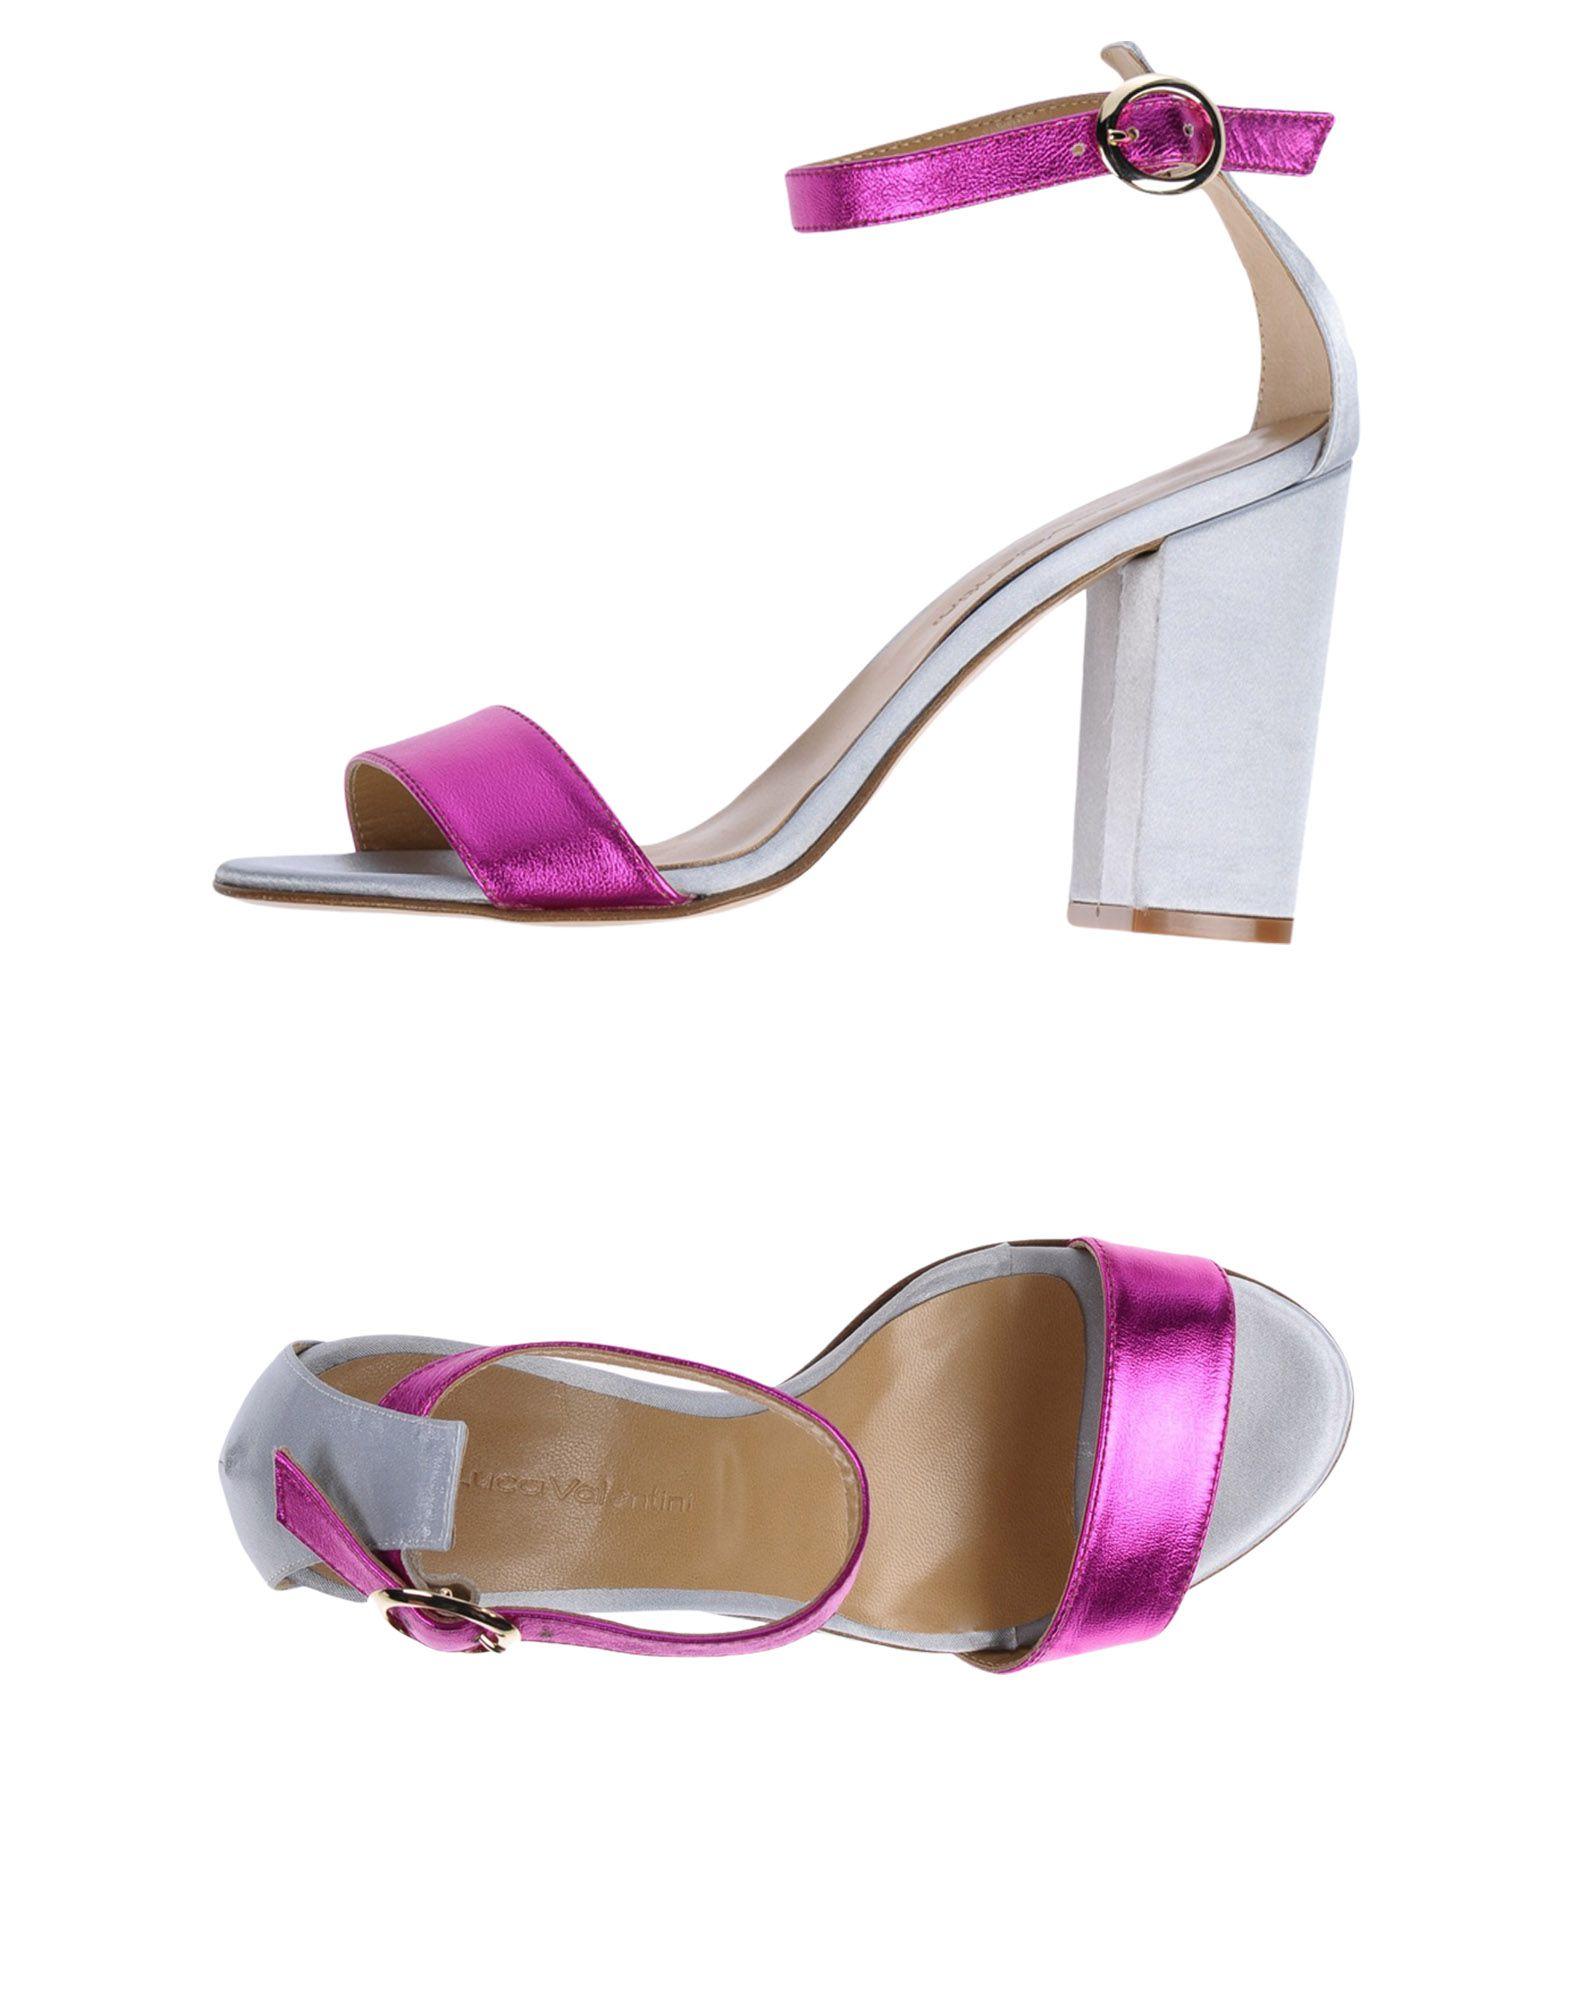 Luca Valentini Sandalen Damen Damen Sandalen  11417105EH Gute Qualität beliebte Schuhe 2c35f6